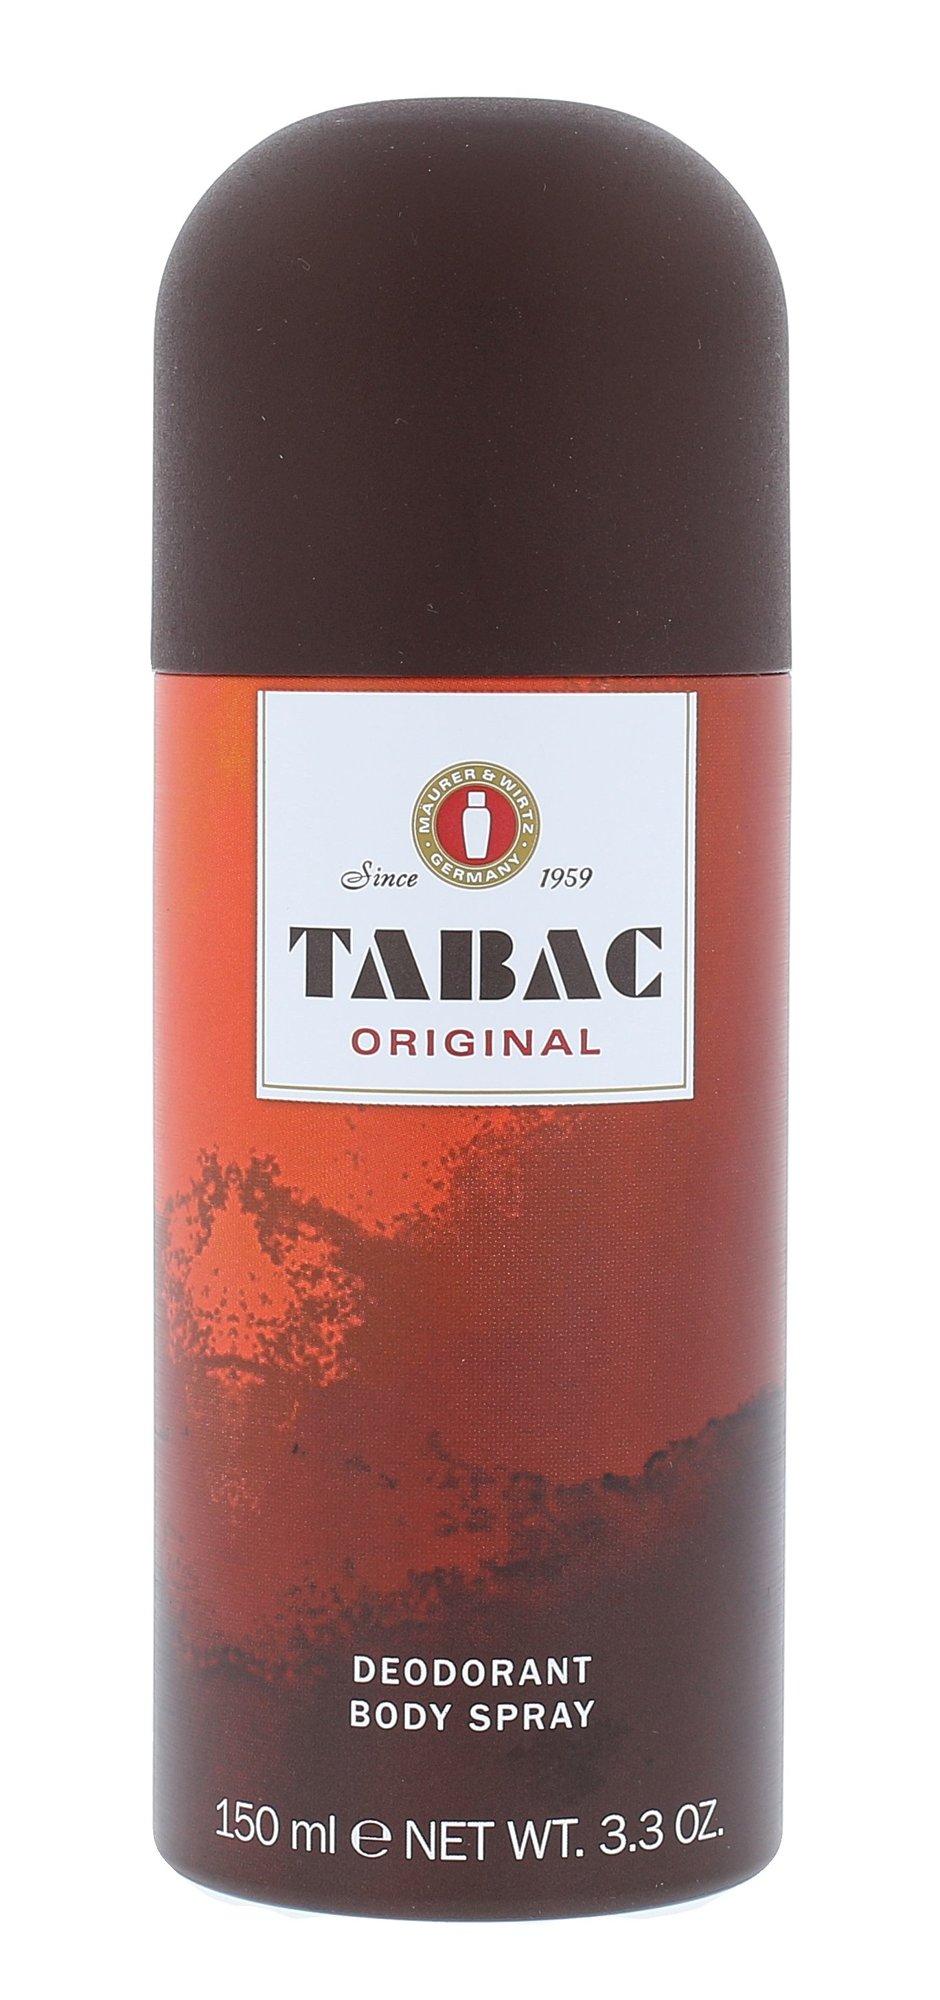 TABAC Original Deodorant 150ml